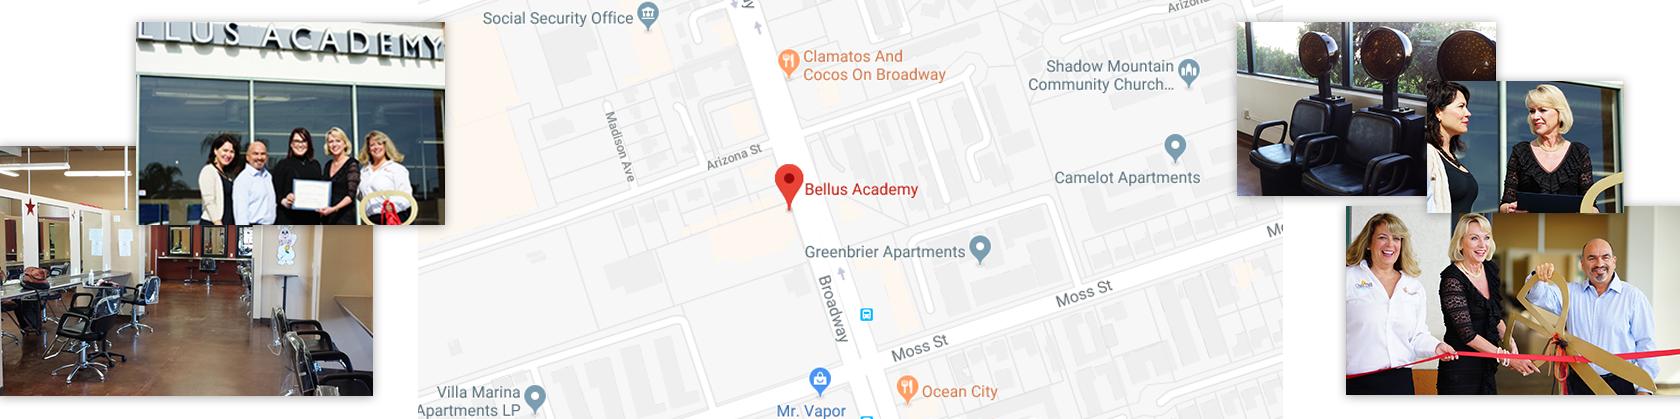 Beauty School in Chula Vista, CA | Bellus Academy